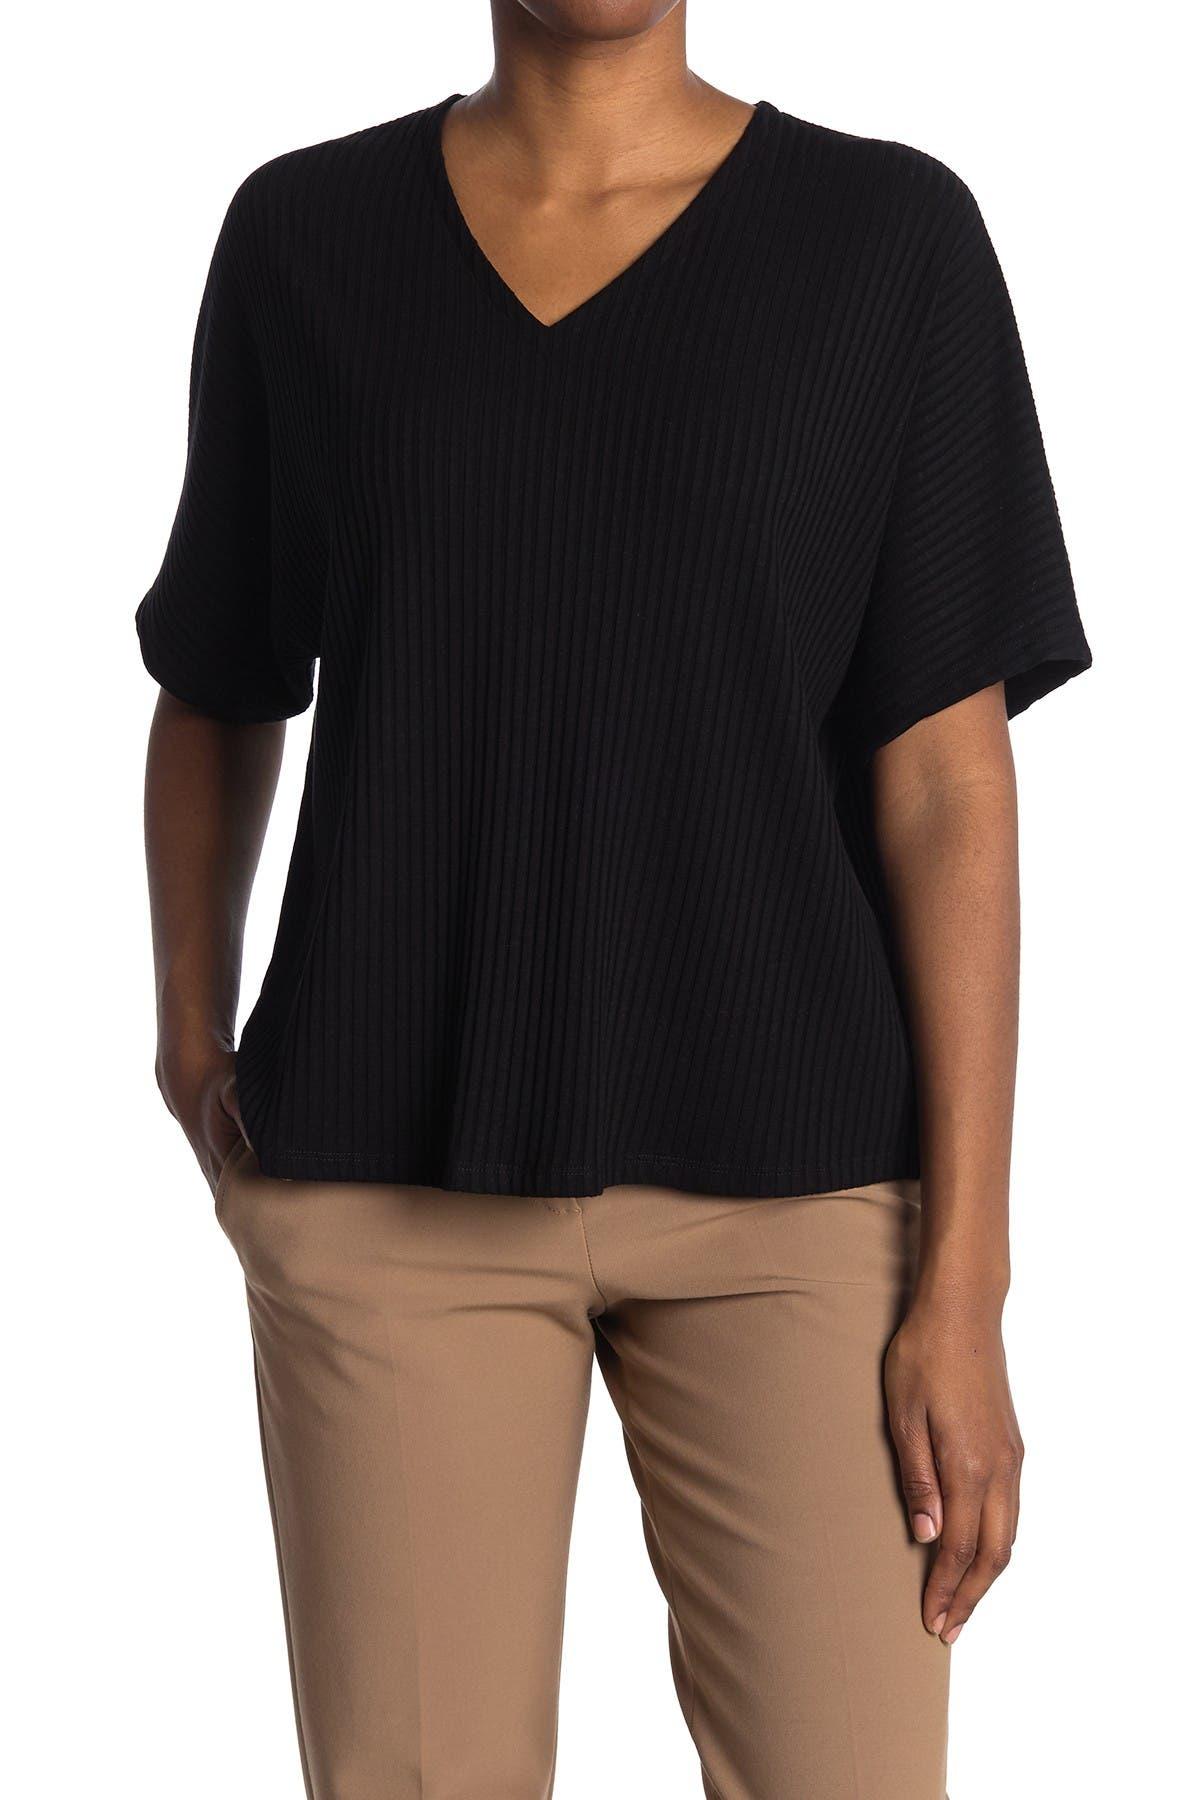 Image of Eileen Fisher V-Neck Short Sleeve Top